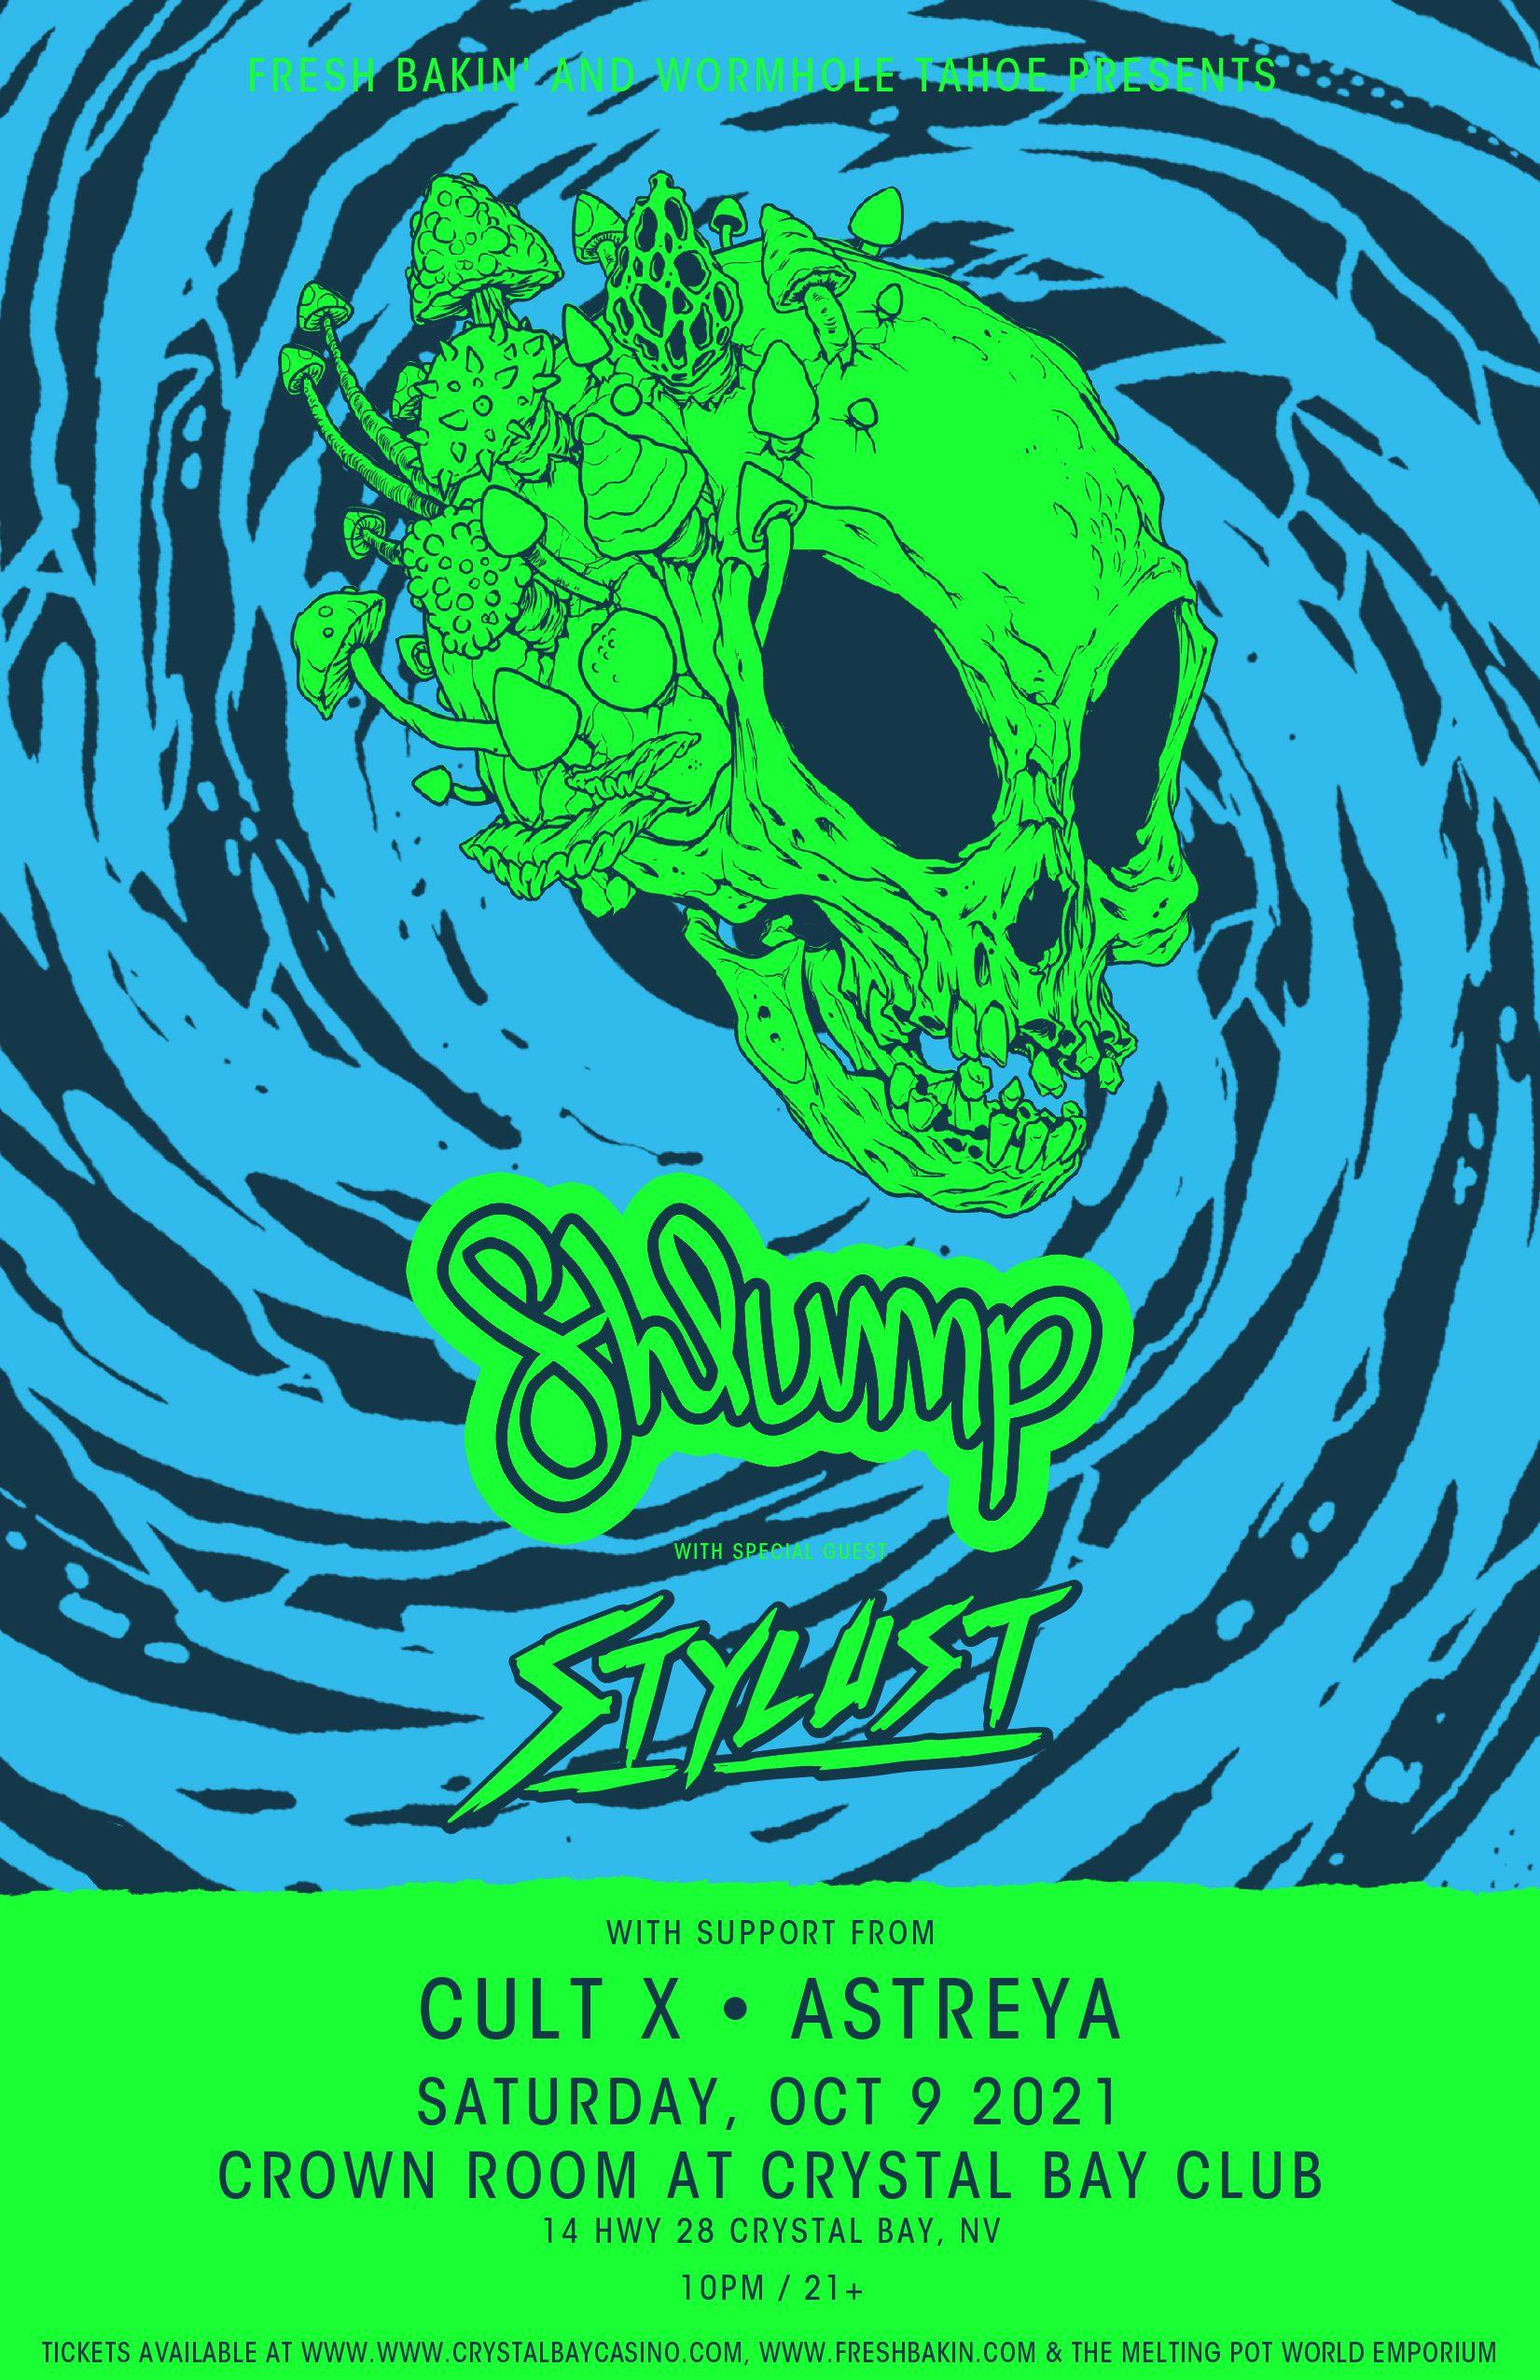 Shlump & Stylust at the Crystal Bay Club 10/6/2021